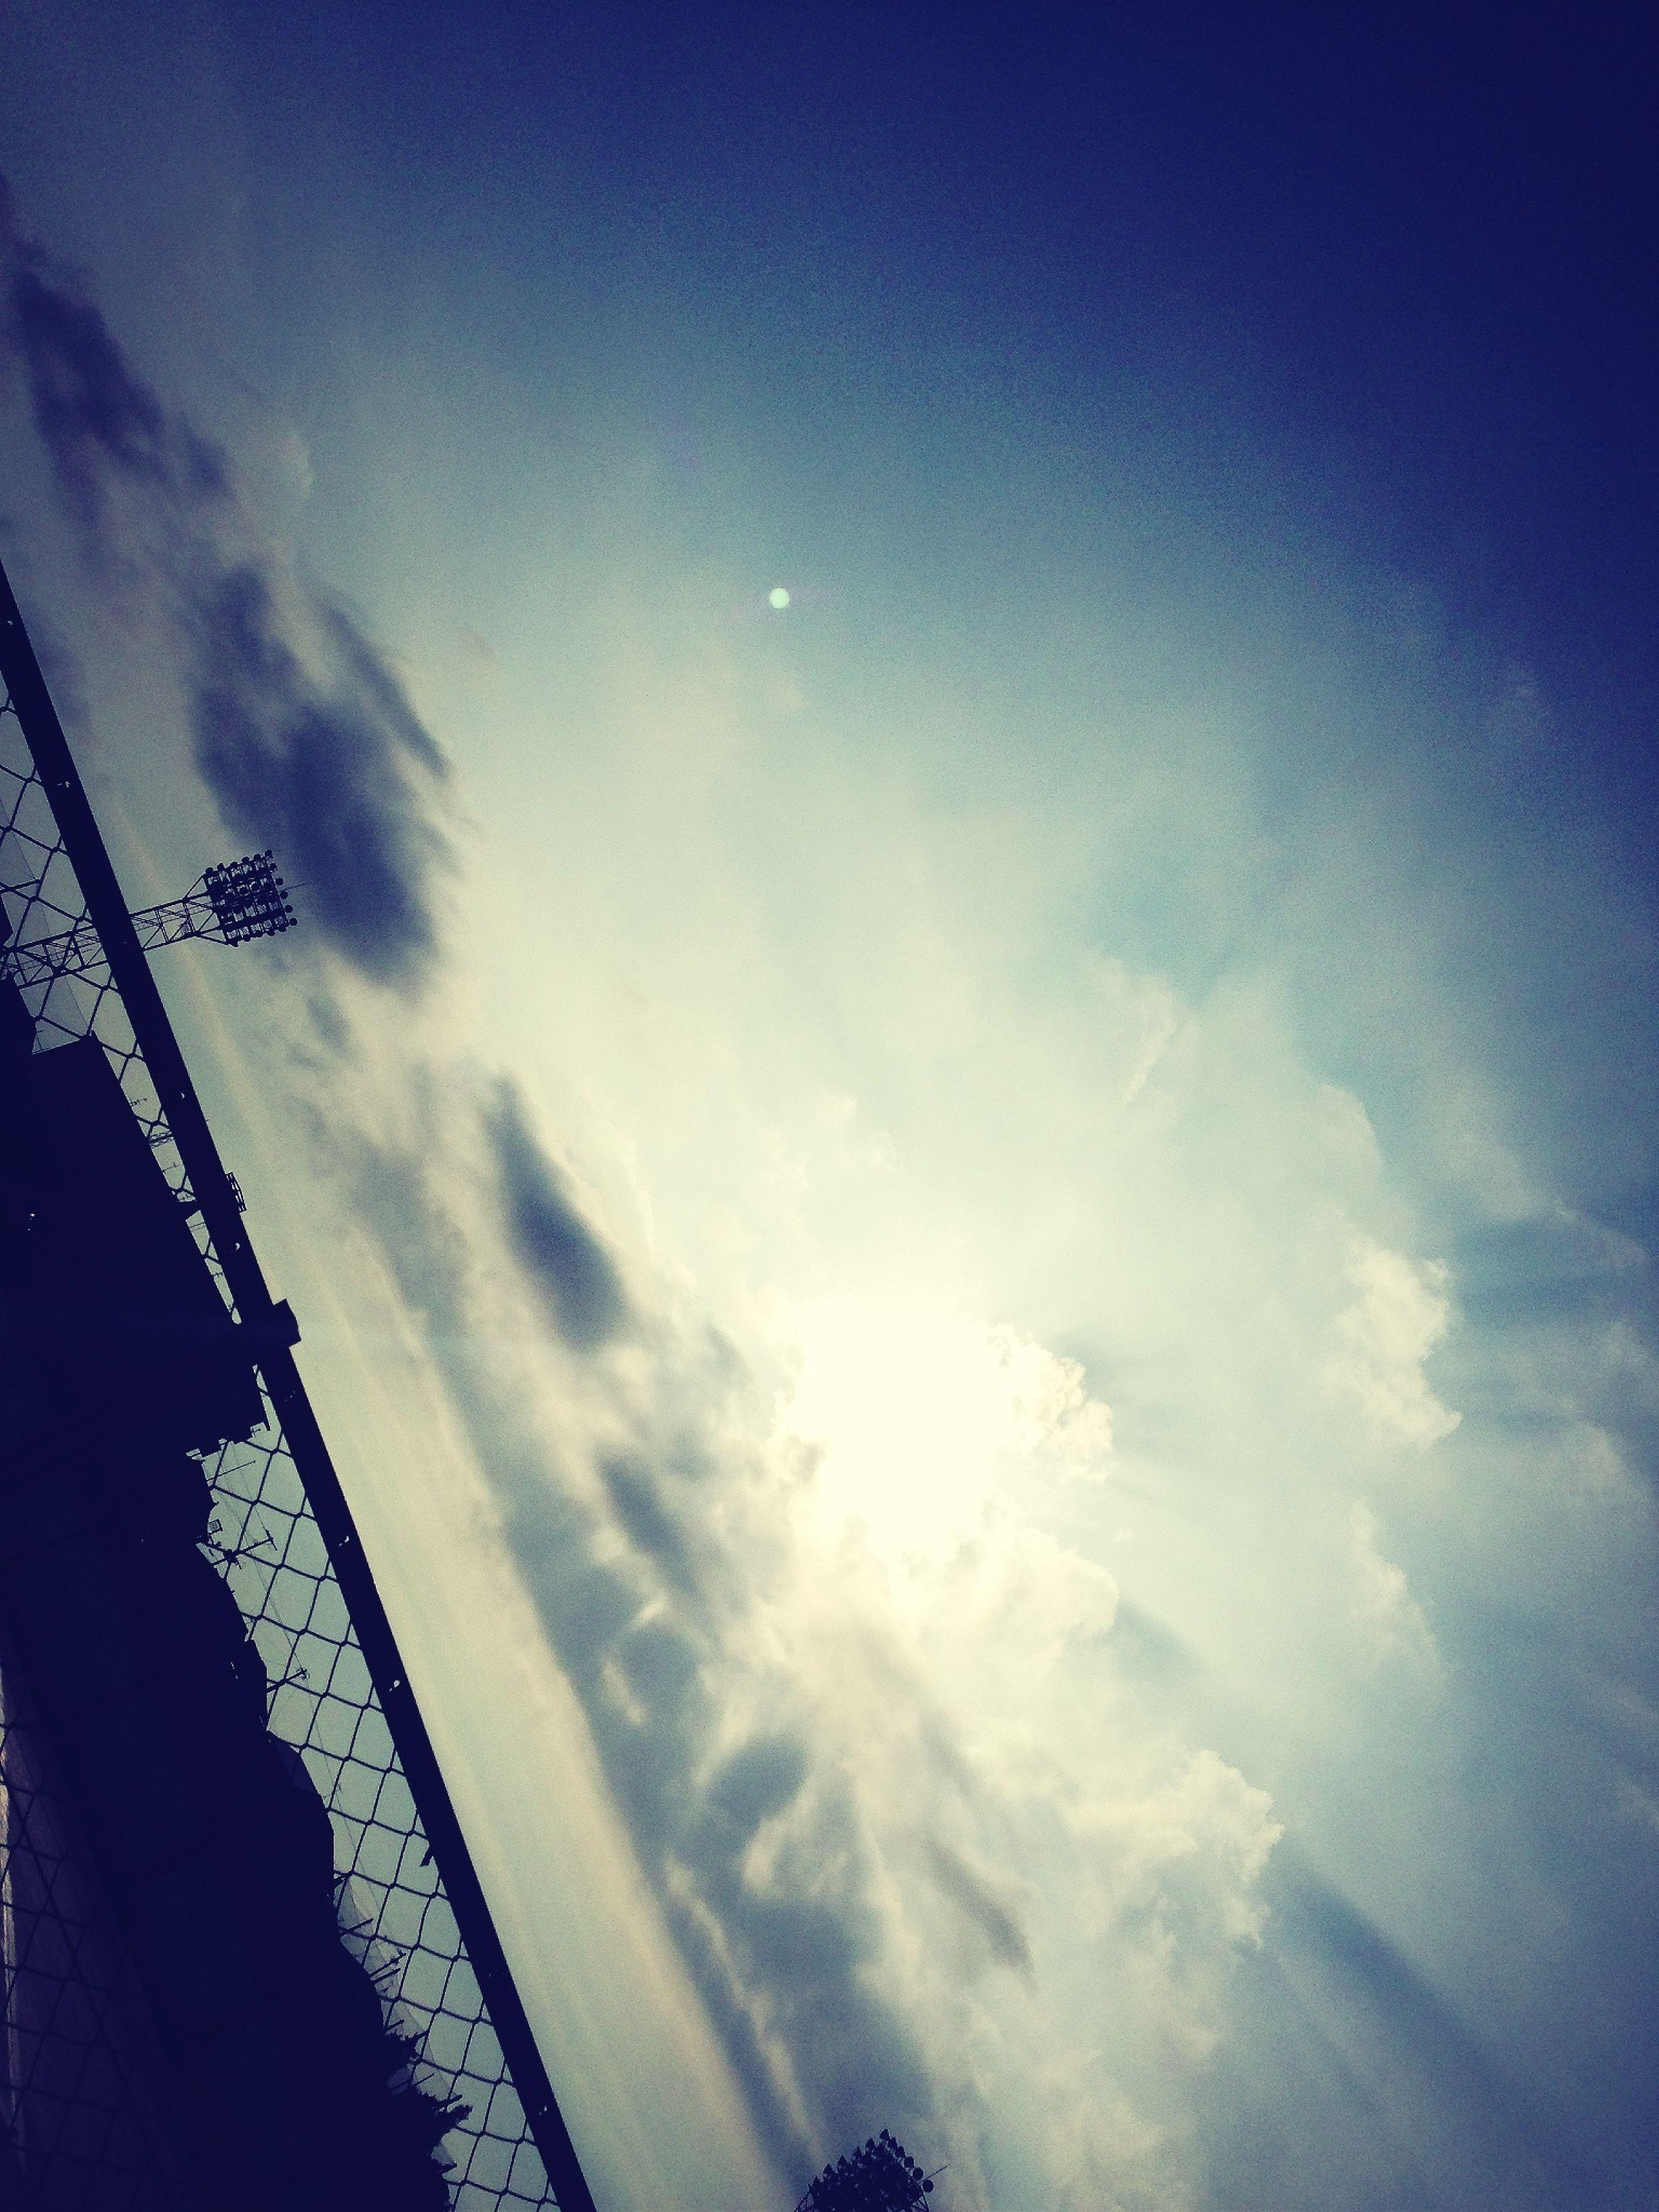 low angle view, sky, blue, cloud - sky, built structure, architecture, building exterior, cloud, sunlight, outdoors, transportation, city, silhouette, day, no people, vapor trail, nature, sunbeam, sun, cloudy